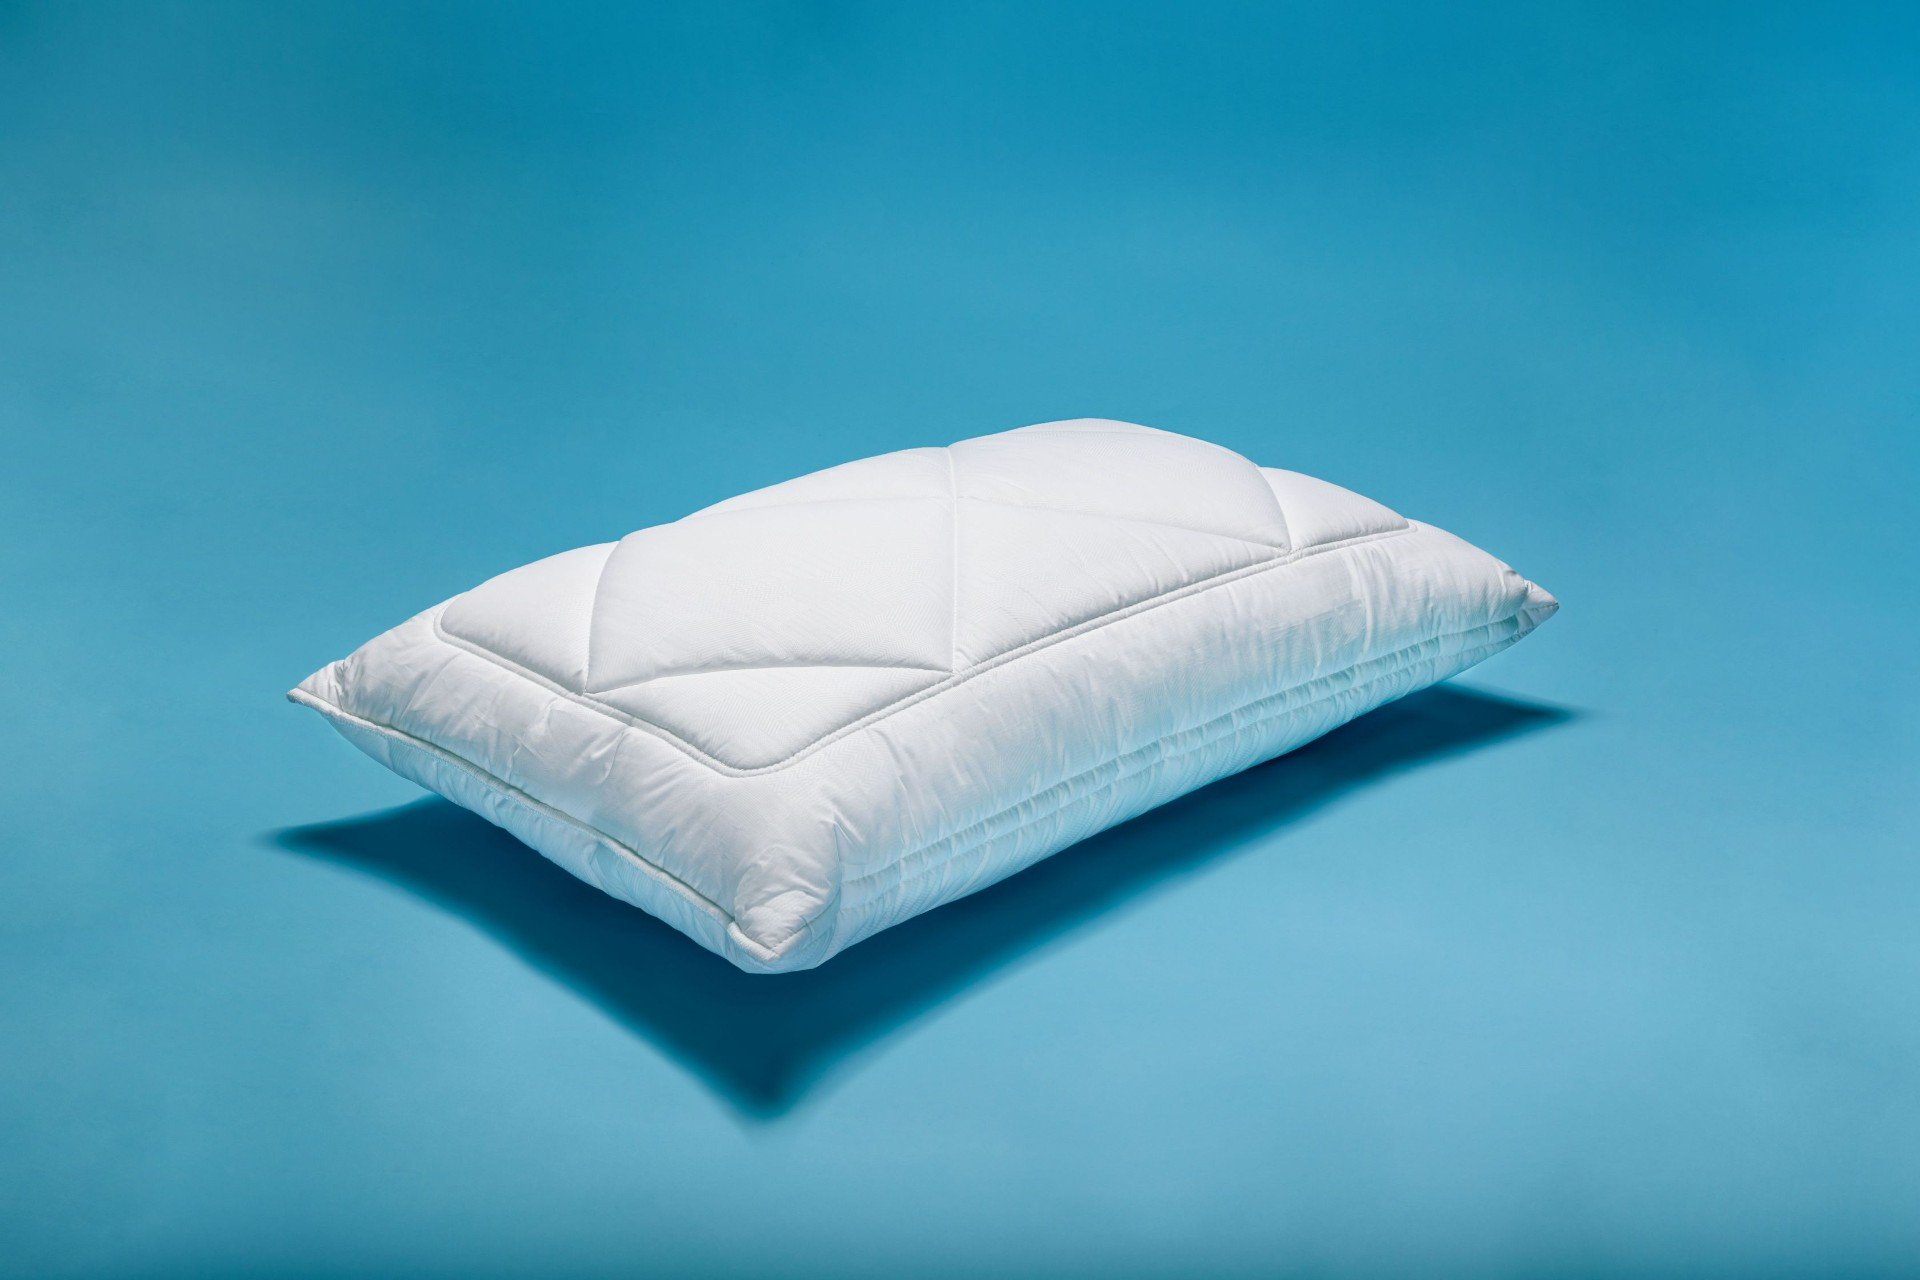 Cuscino classico alto e morbido comfort – Fabe